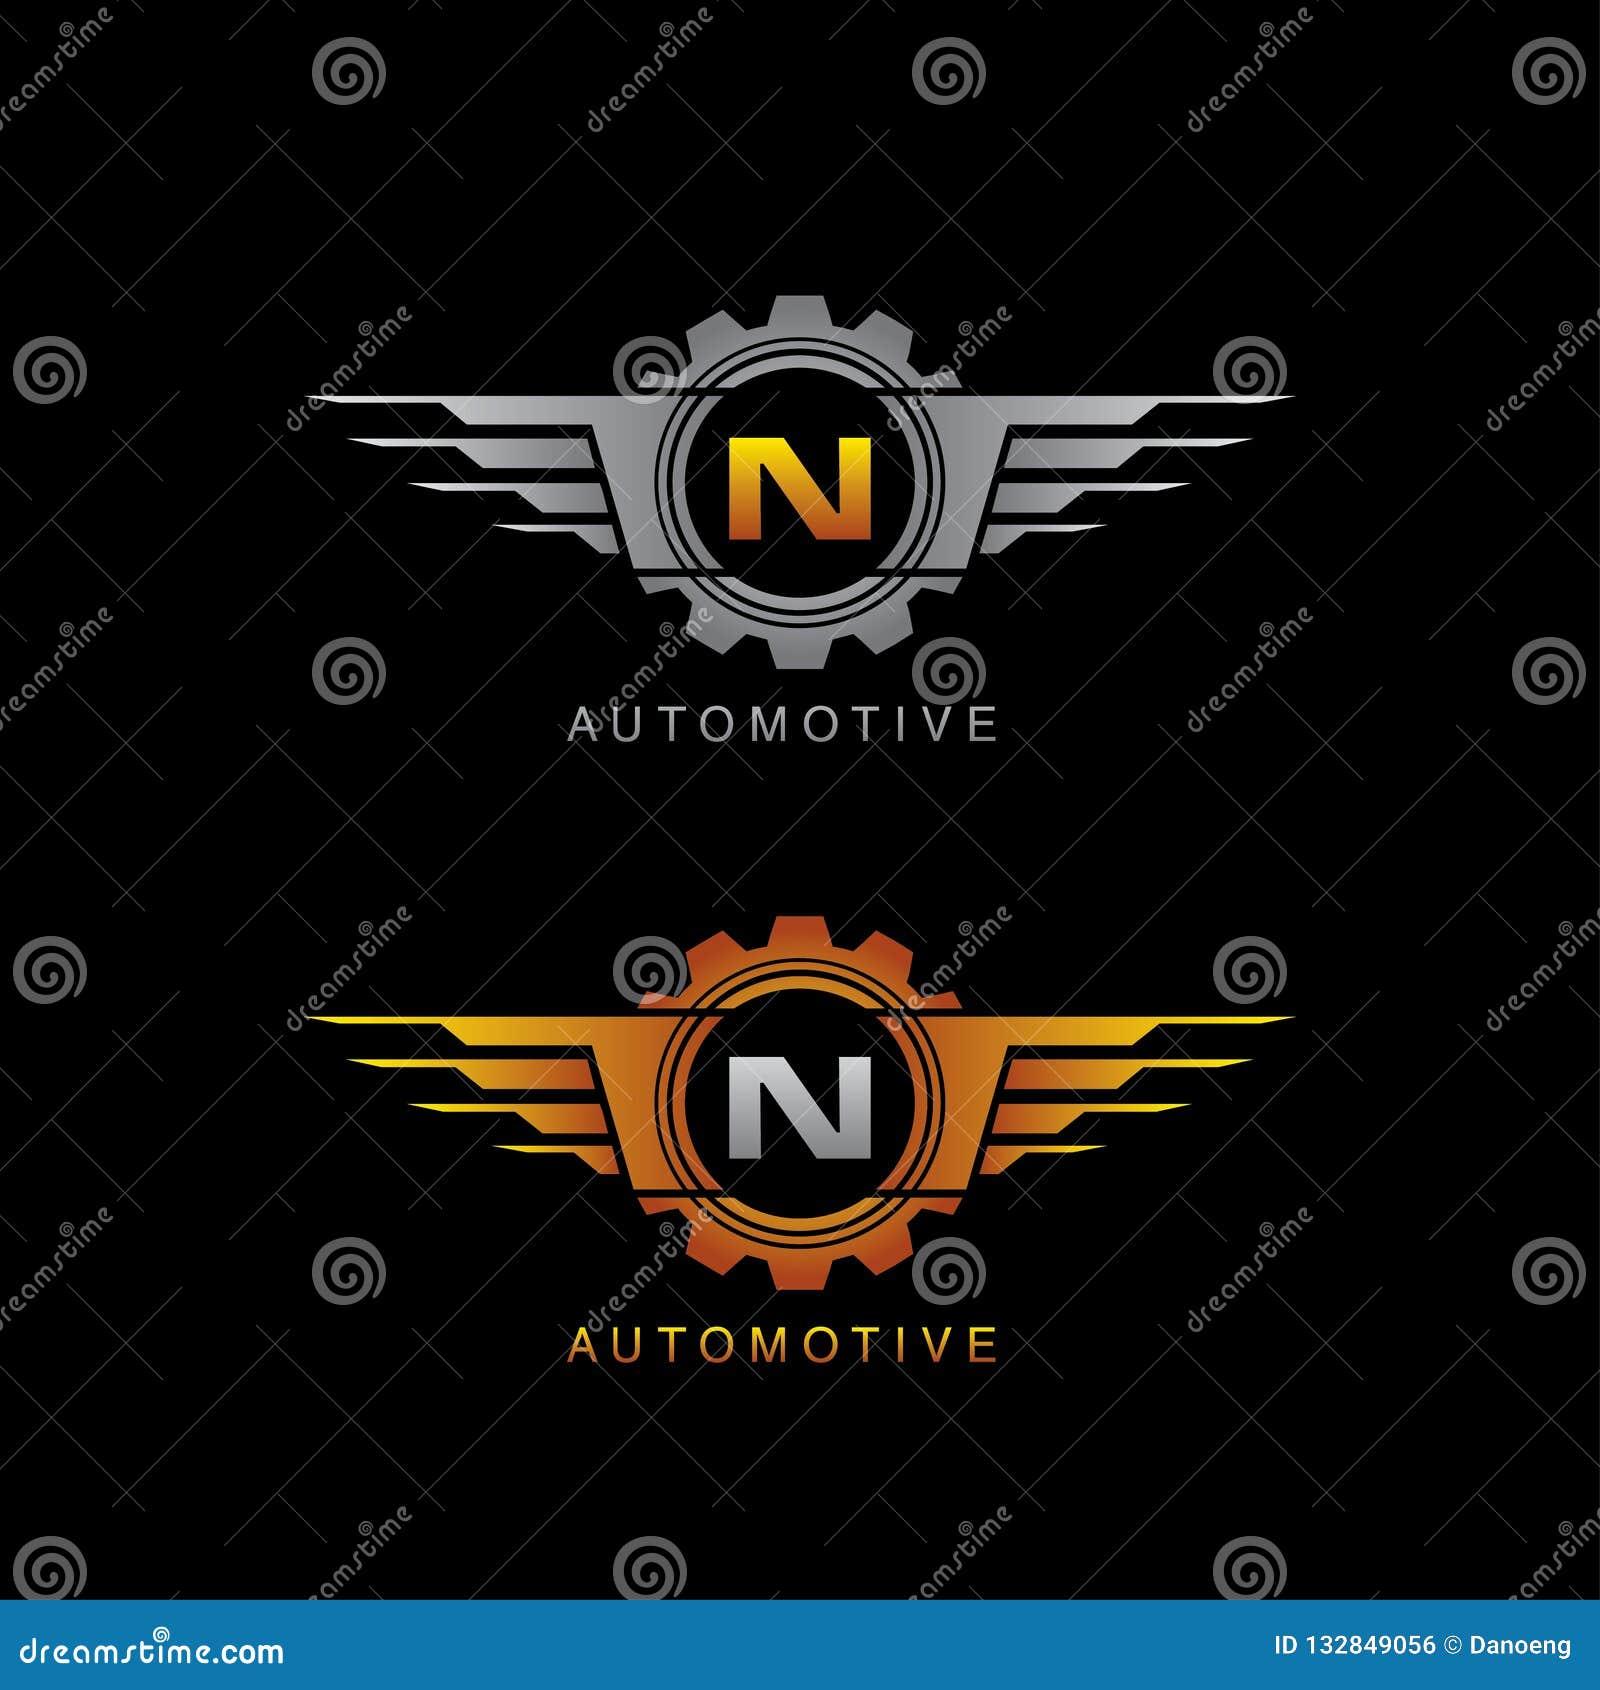 Automotive Gear Wing N Letter Logo Stock Illustration